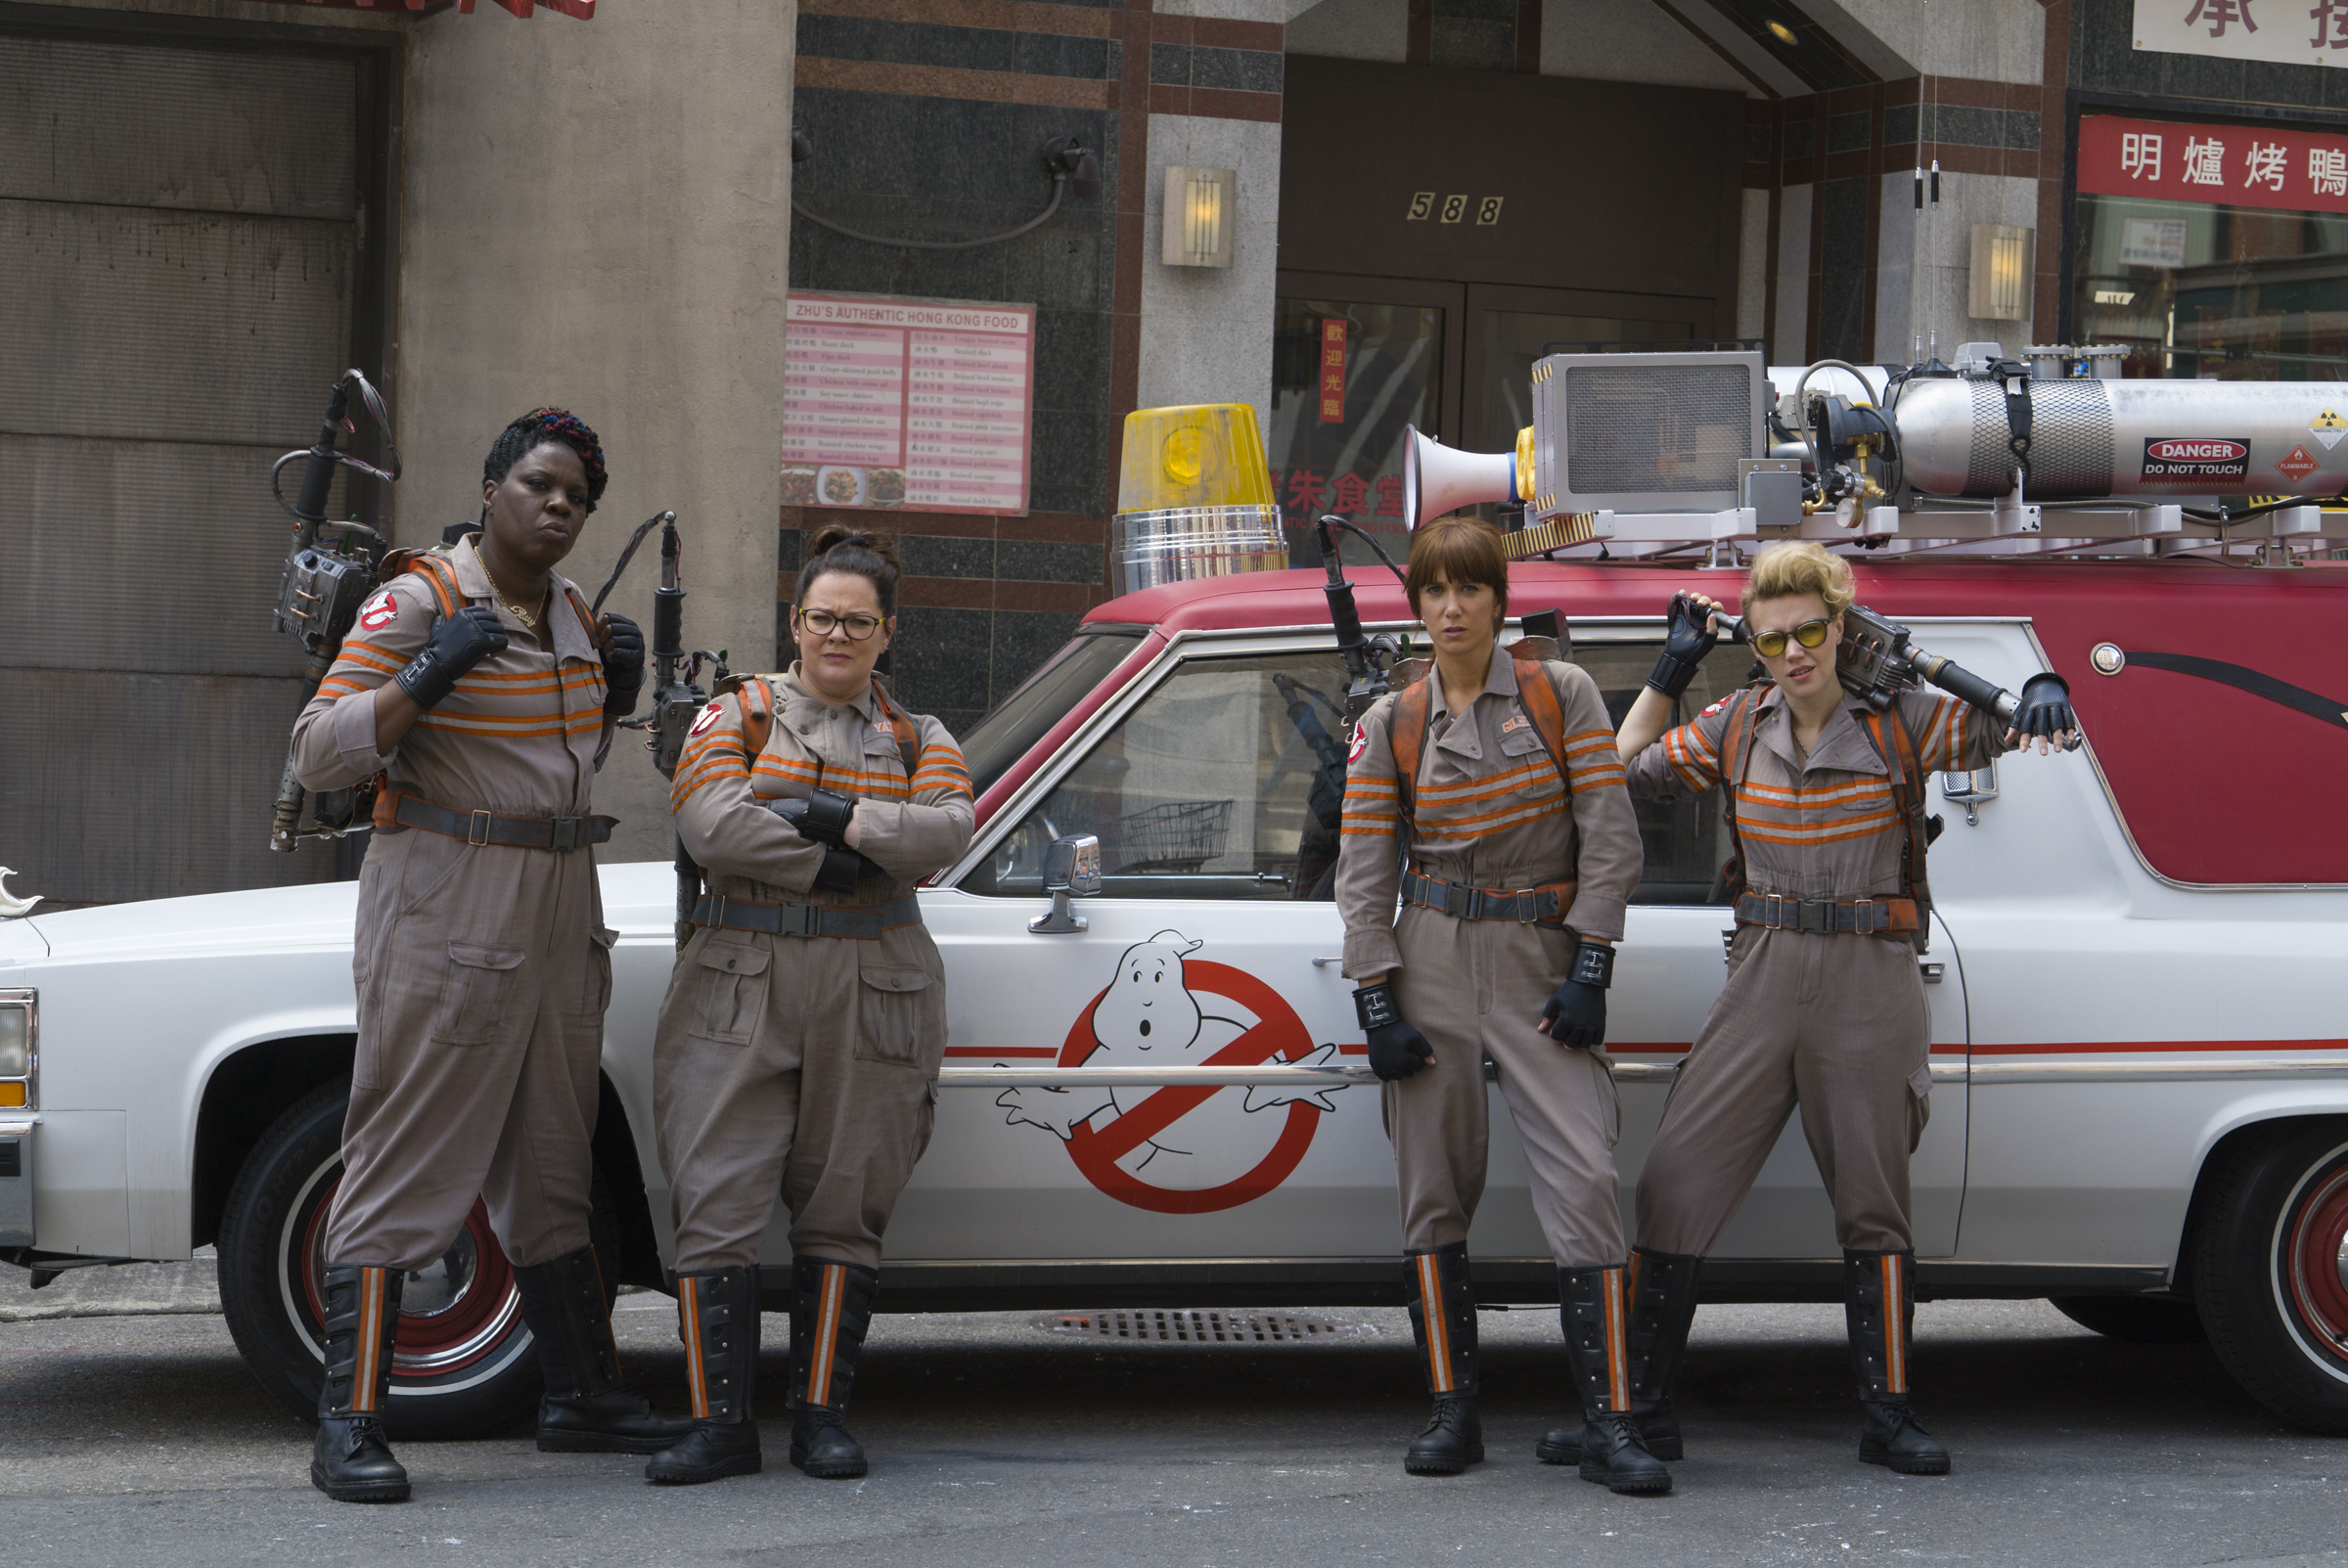 Leslie Jones, Melissa McCarthy, Kristen Wiig and Kate Mckinnon in  Ghostbusters.